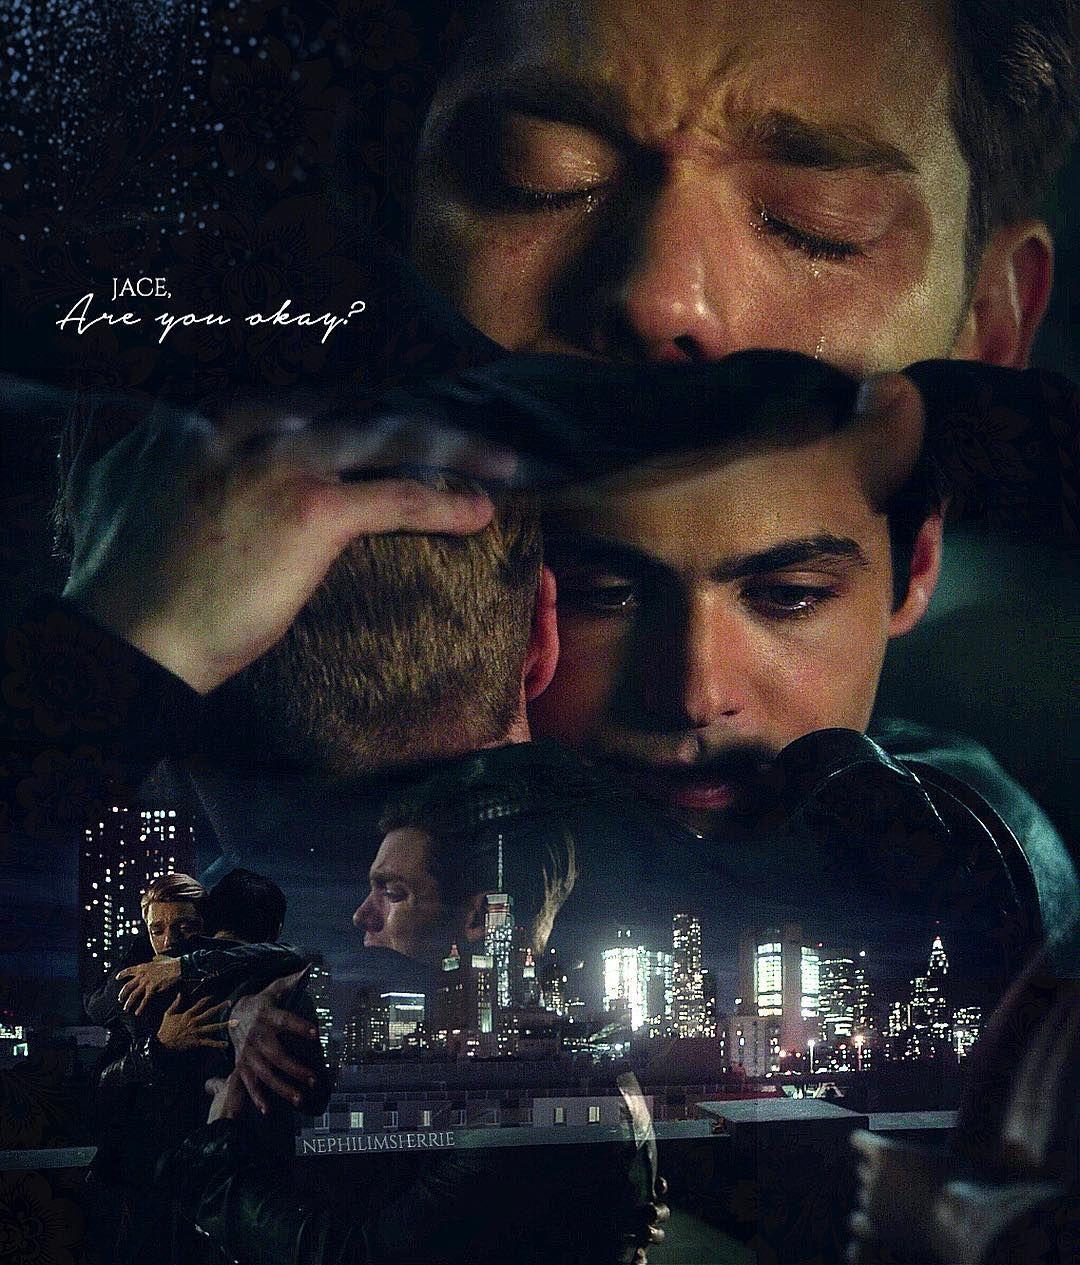 "#Shadowhunters 2x11 ""Mea Maxima Culpa"" - Jace and Alec >> NOOO STHAP AHHH"